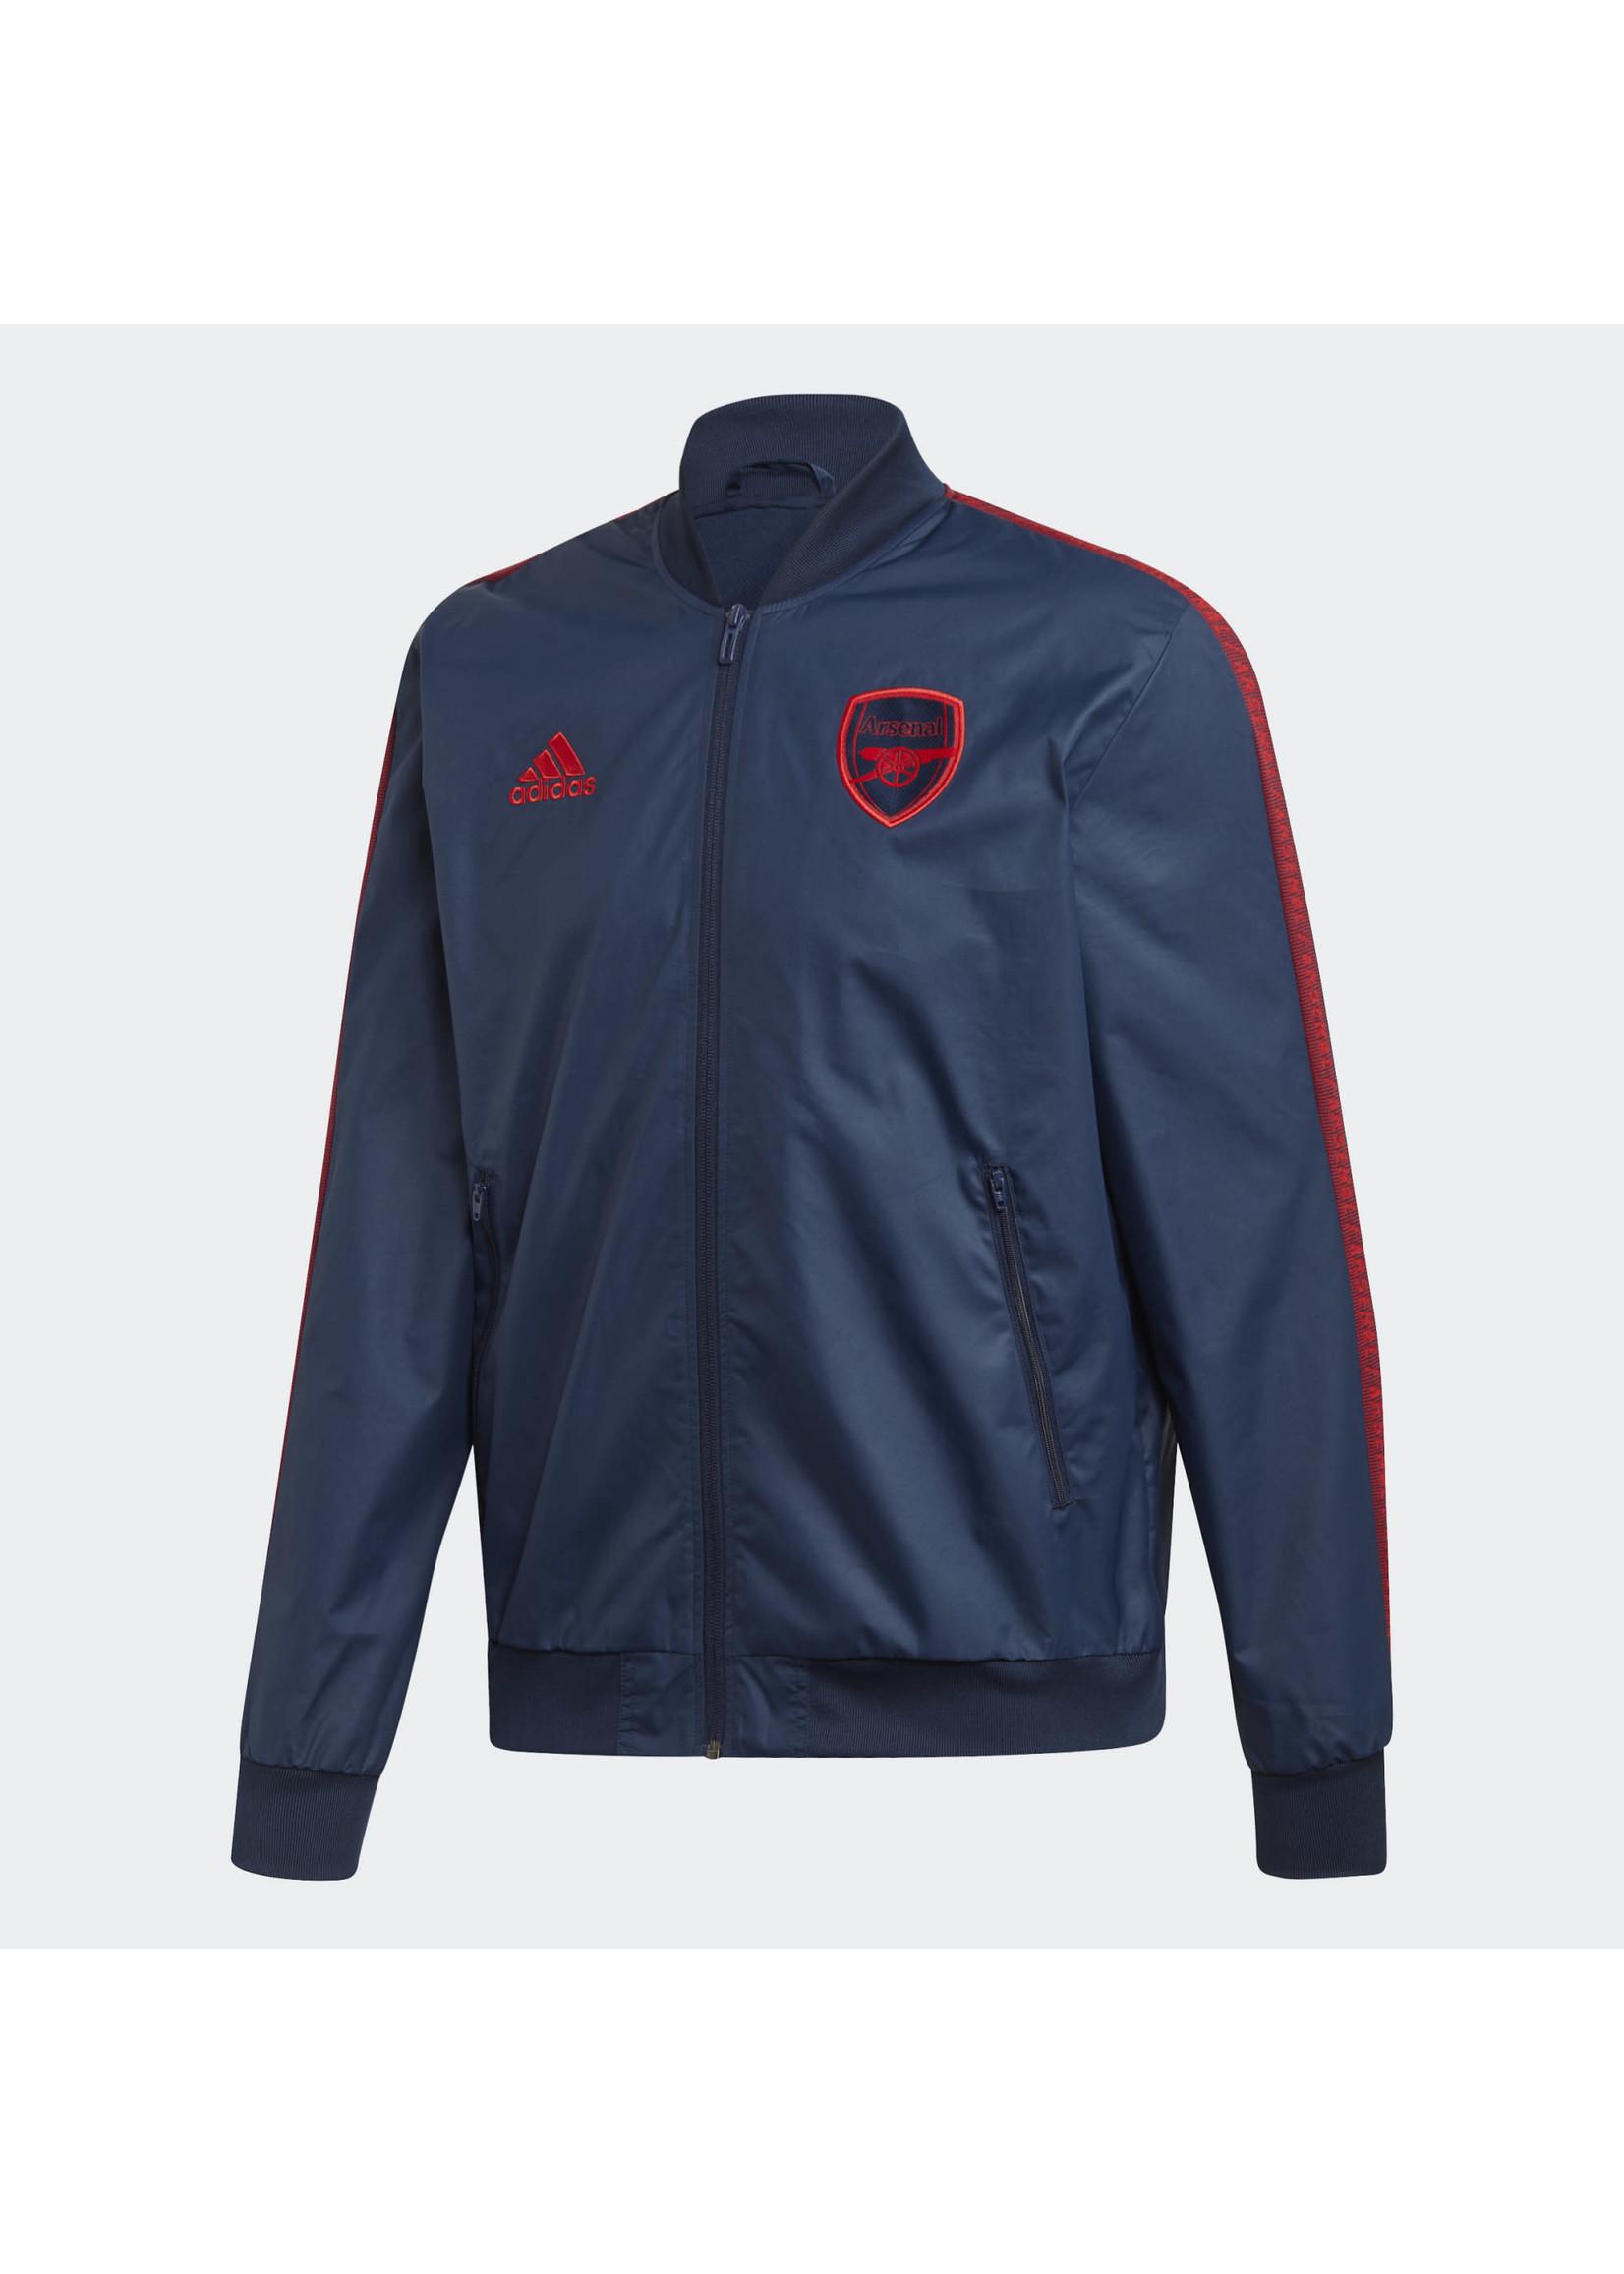 Adidas Arsenal Windbreaker Full Zip - Navy/Red